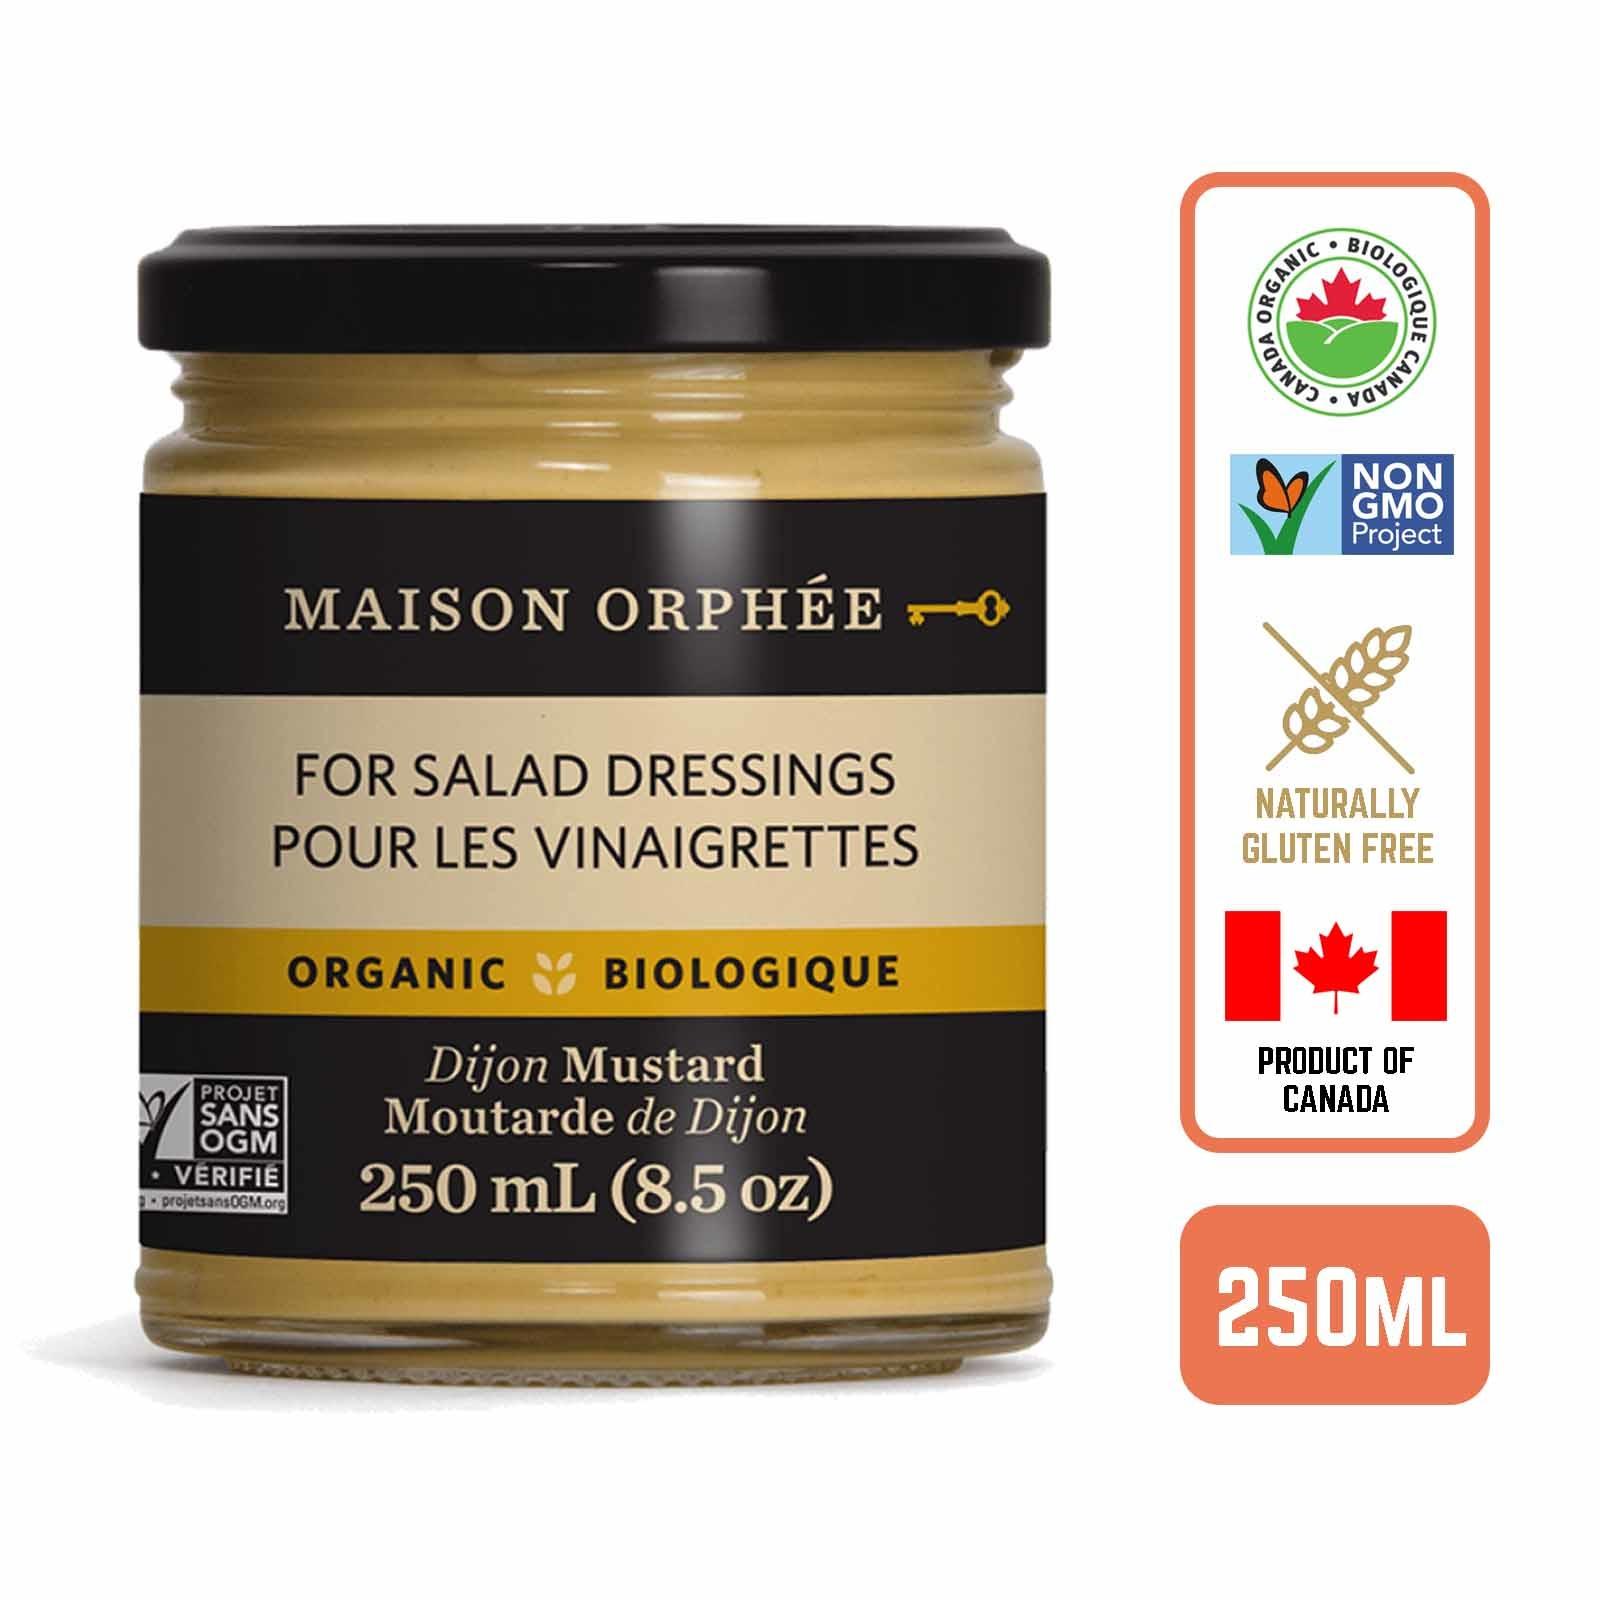 Maison Orphee Organic Dijon Mustard - by Foodsterr